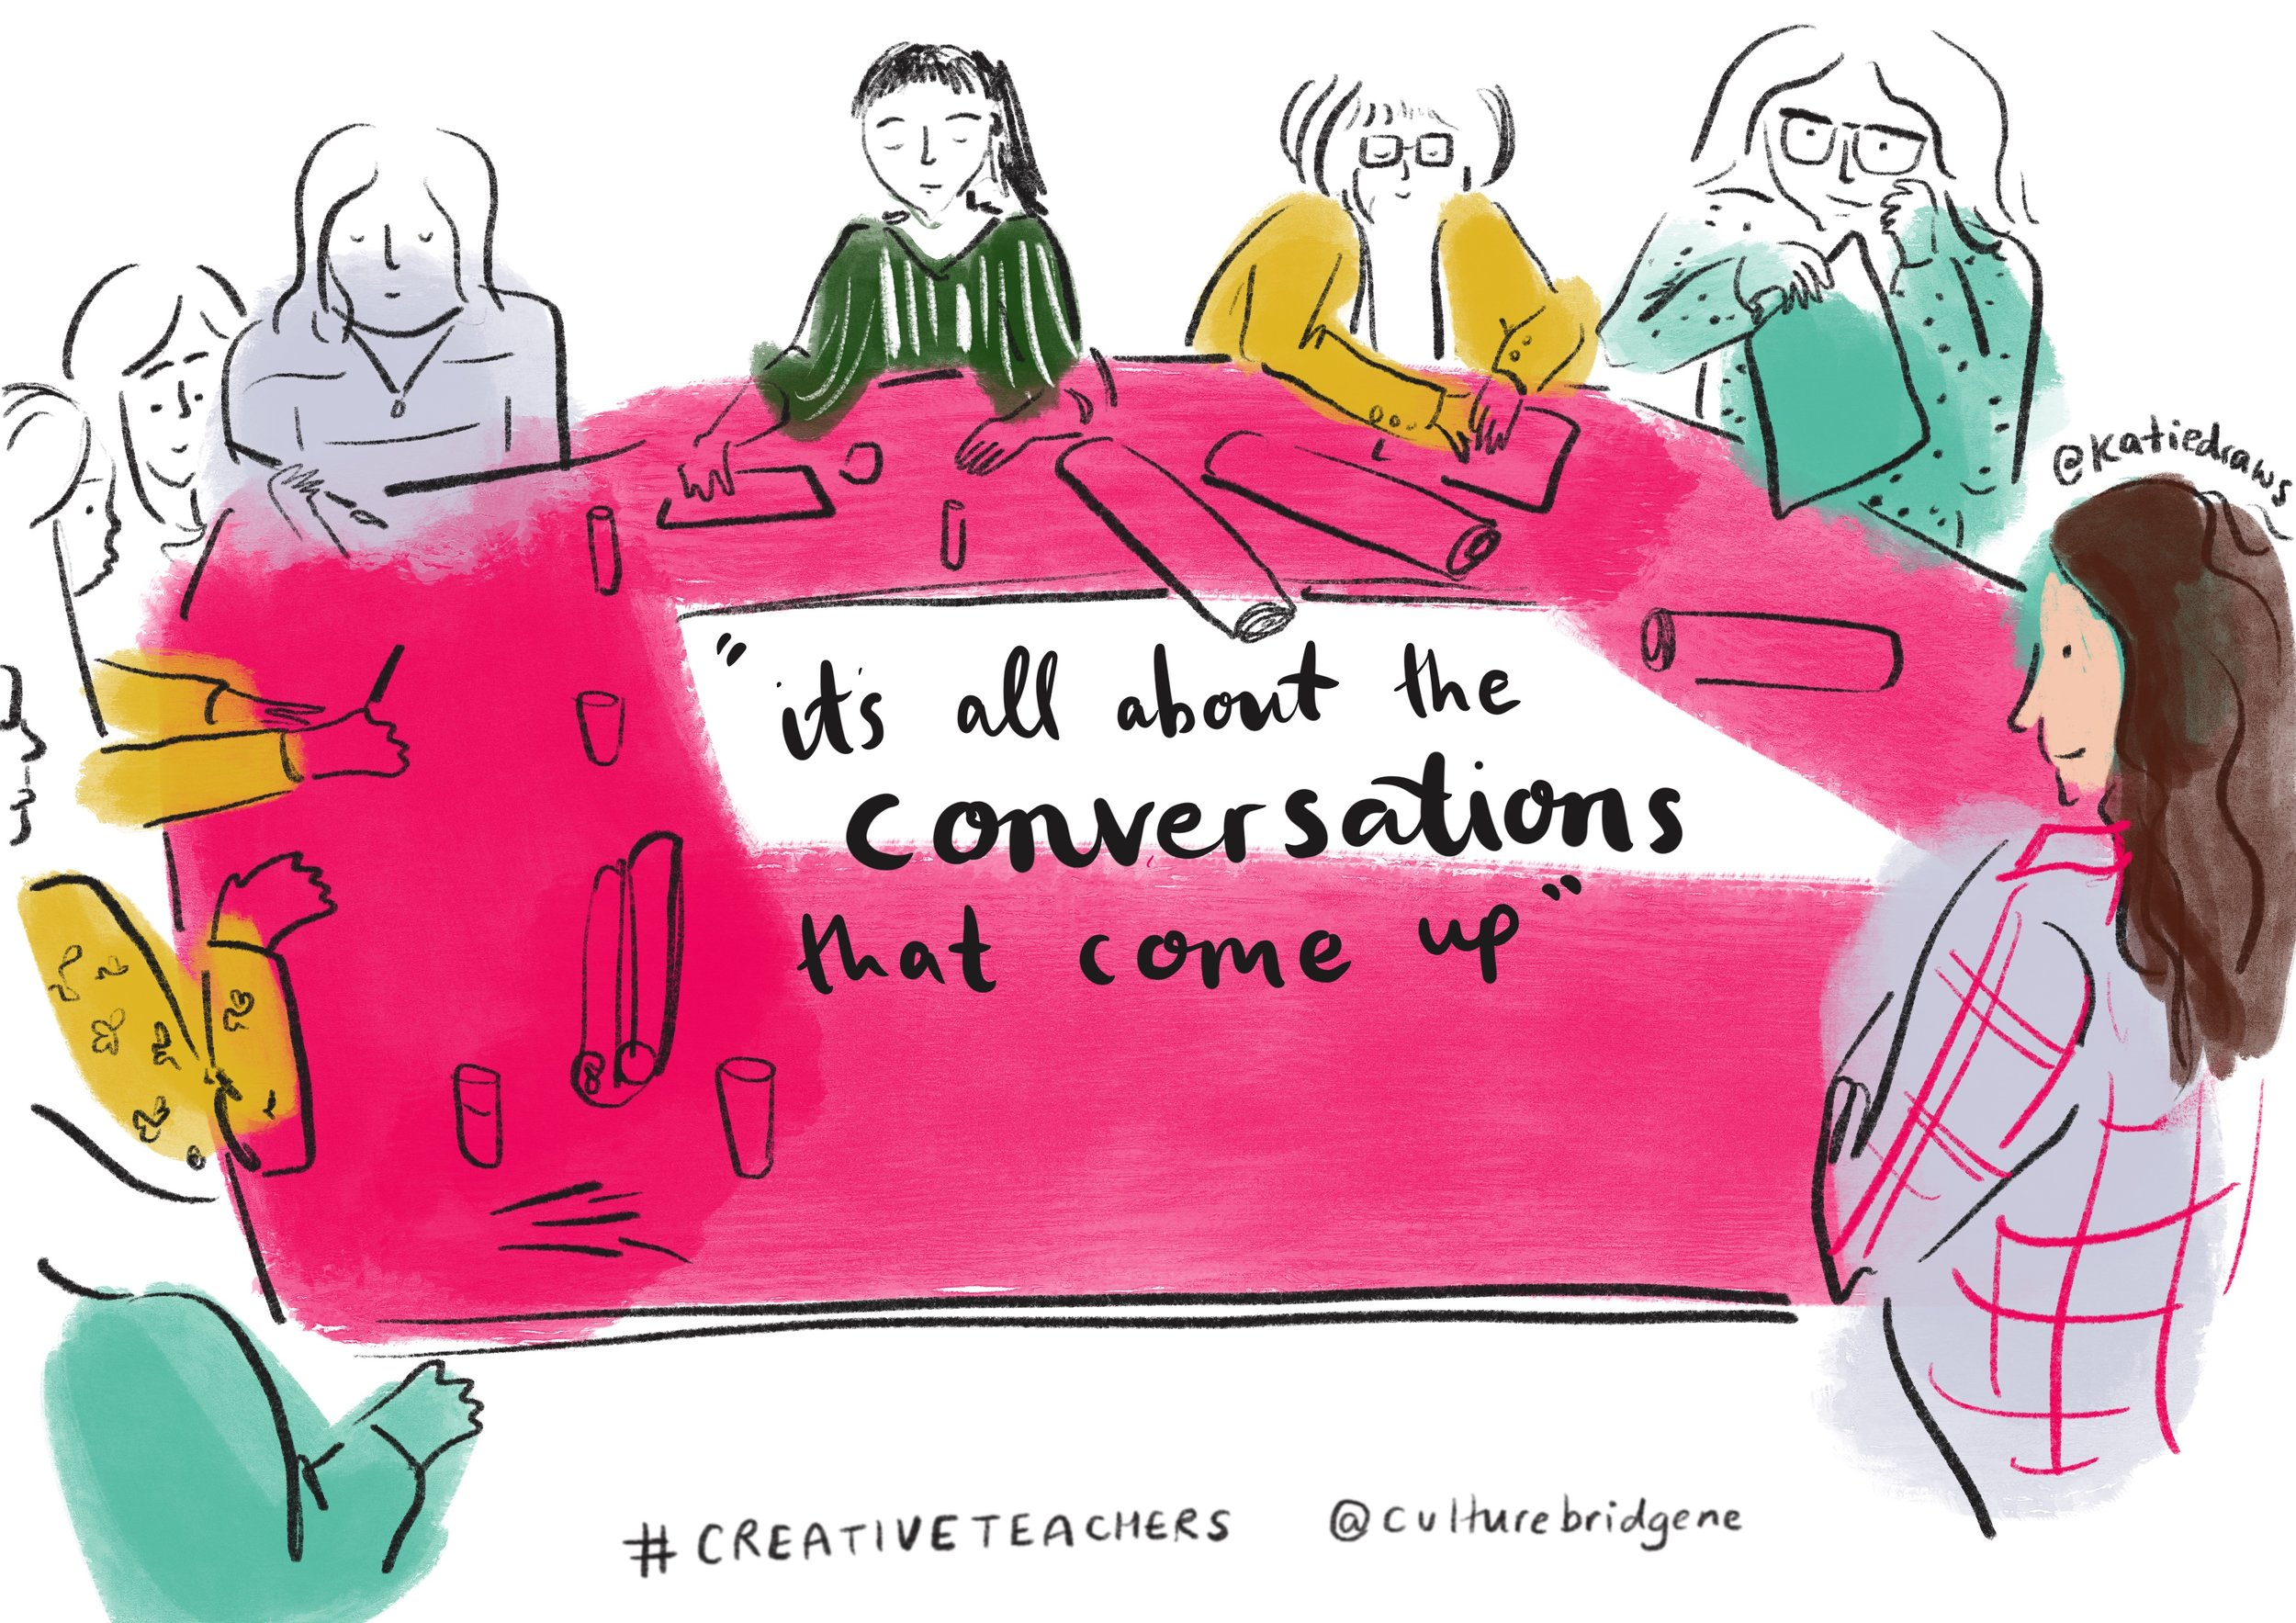 Big Creative Teachers Event - Live drawing conversation.jpg